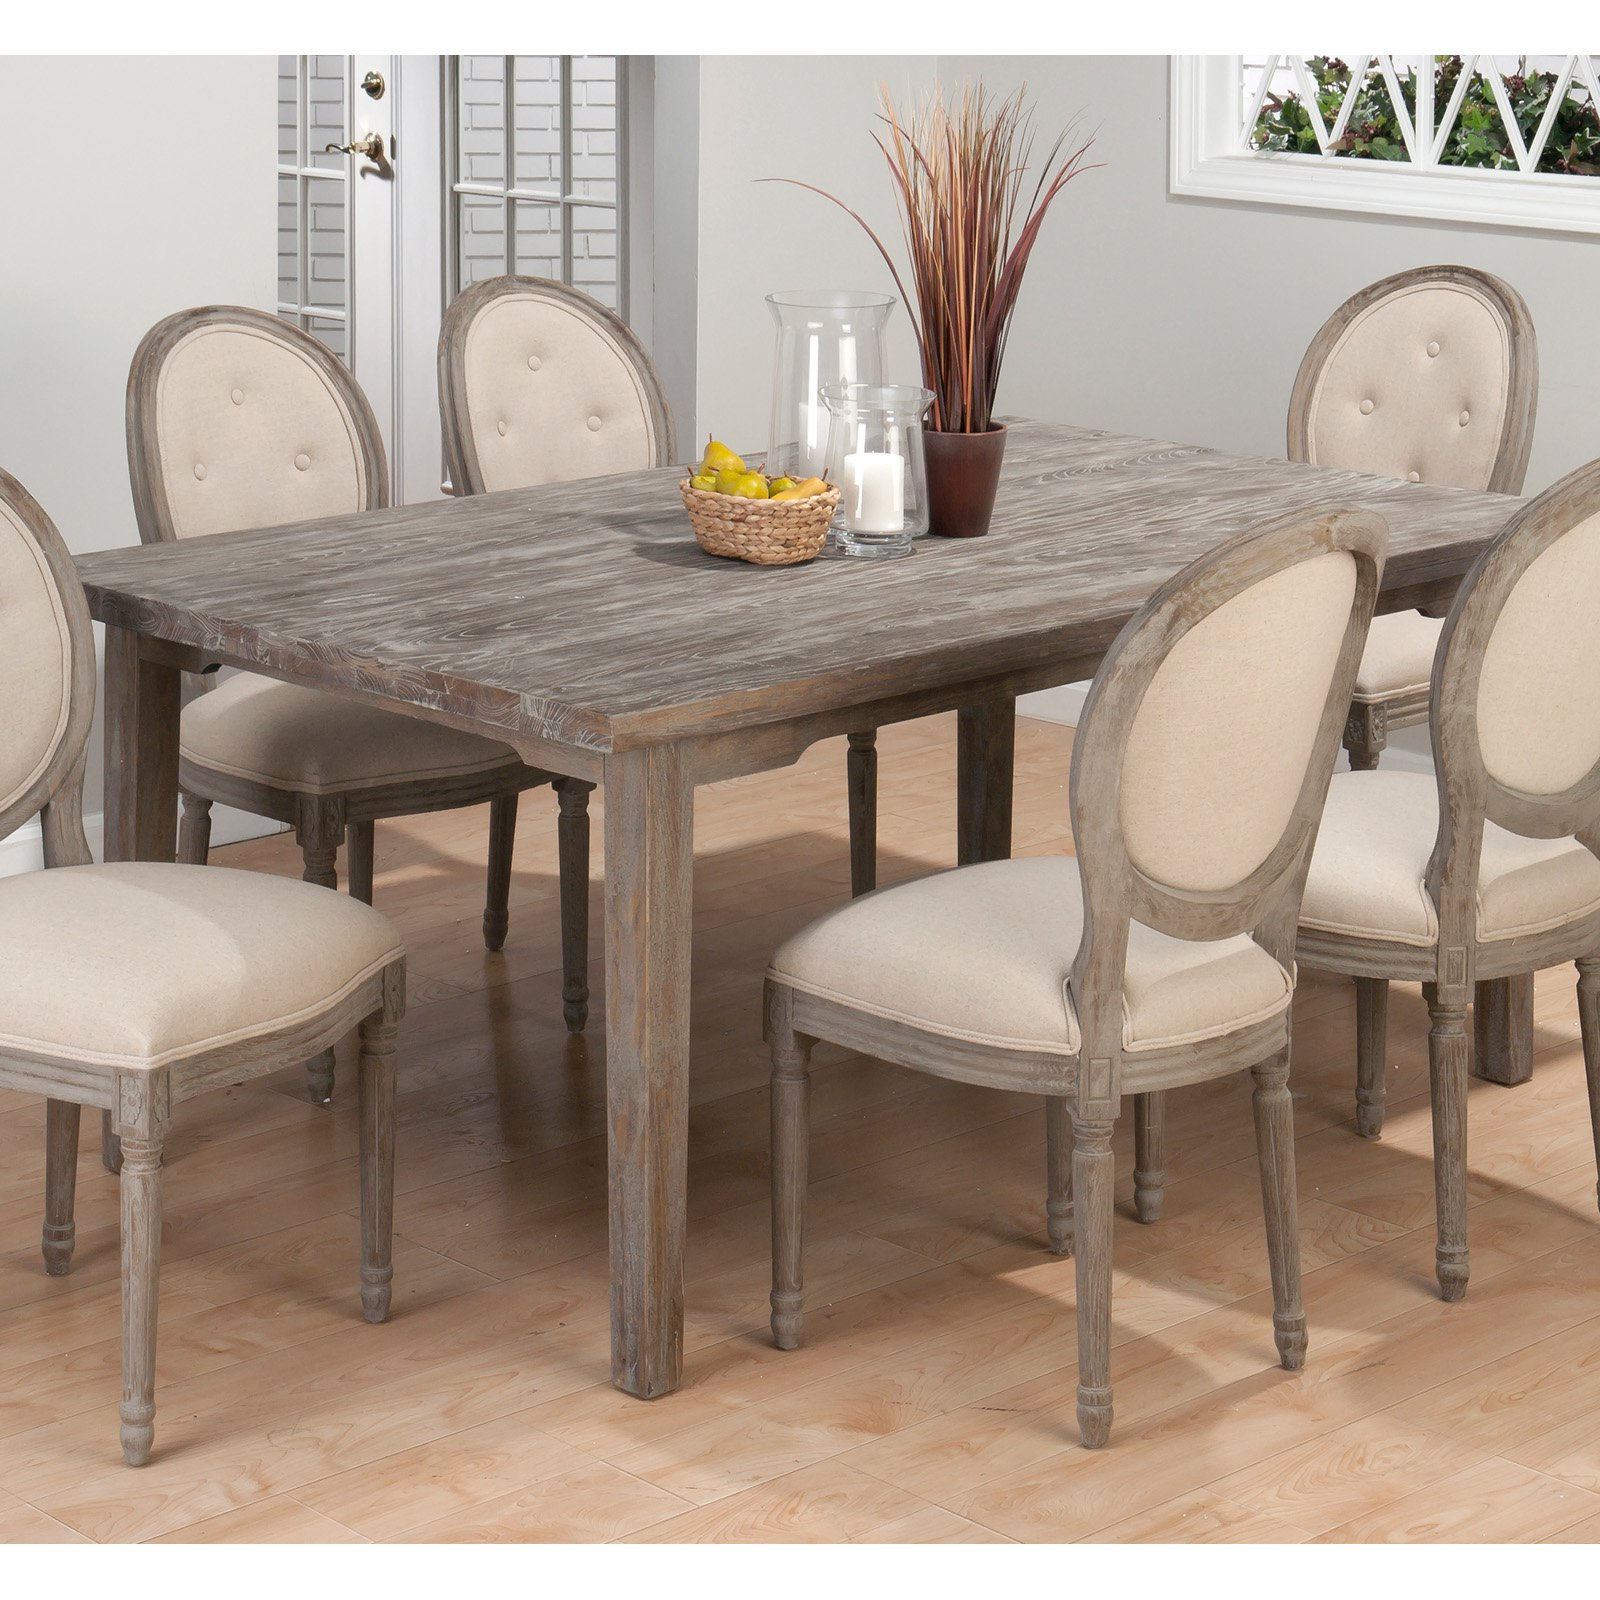 & Jofran Booth Bay Rectangle Leg Table - Burnt Grey - Walmart.com